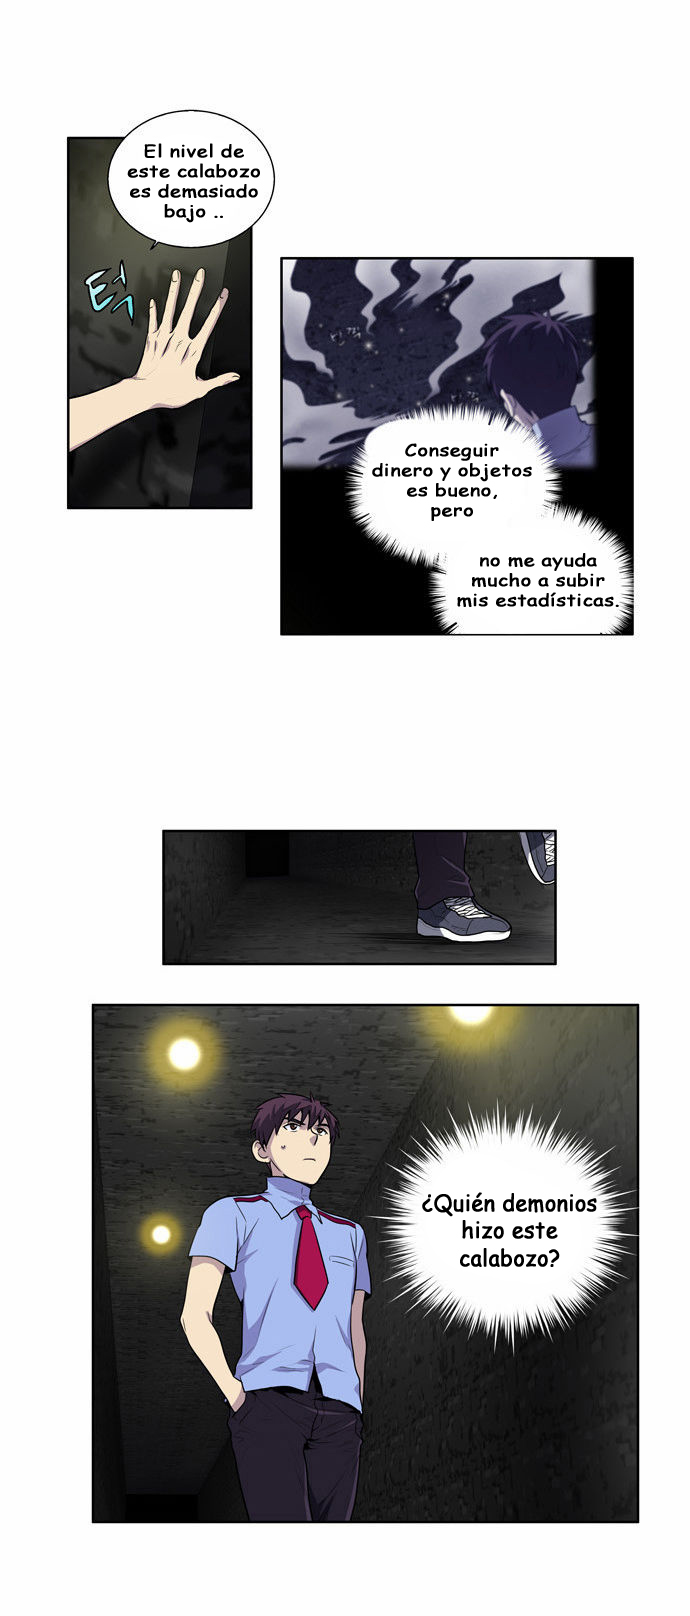 https://c5.ninemanga.com/es_manga/61/1725/396910/f72f05e91d583cf63ae47e955ca9c312.jpg Page 2